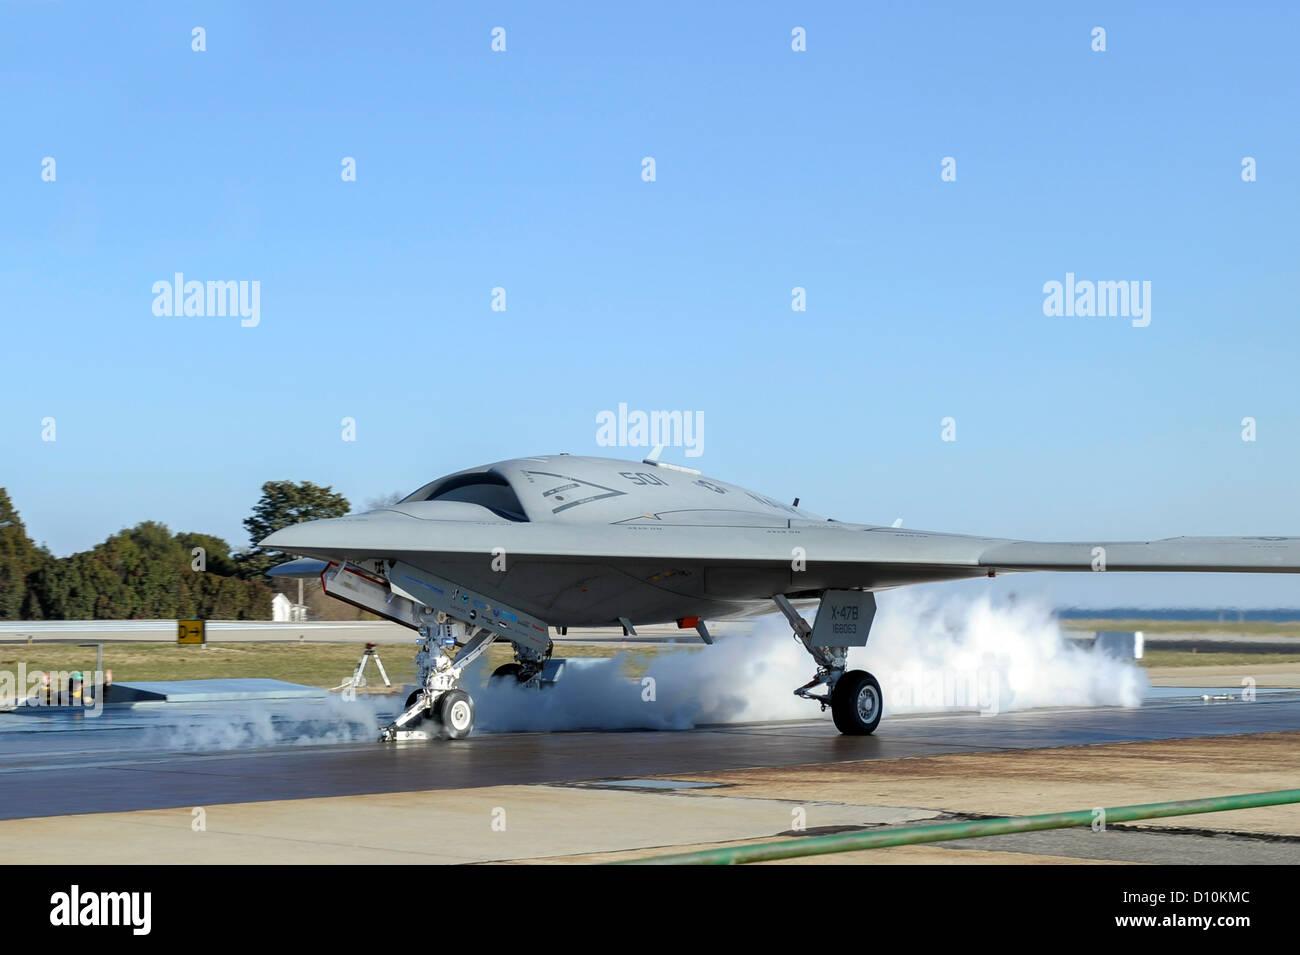 Start-Crew bereitet seinen ersten landgestützten Katapultstart X-47 b Unmanned Combat Air Systems (UCAS) Demonstrator. Stockfoto